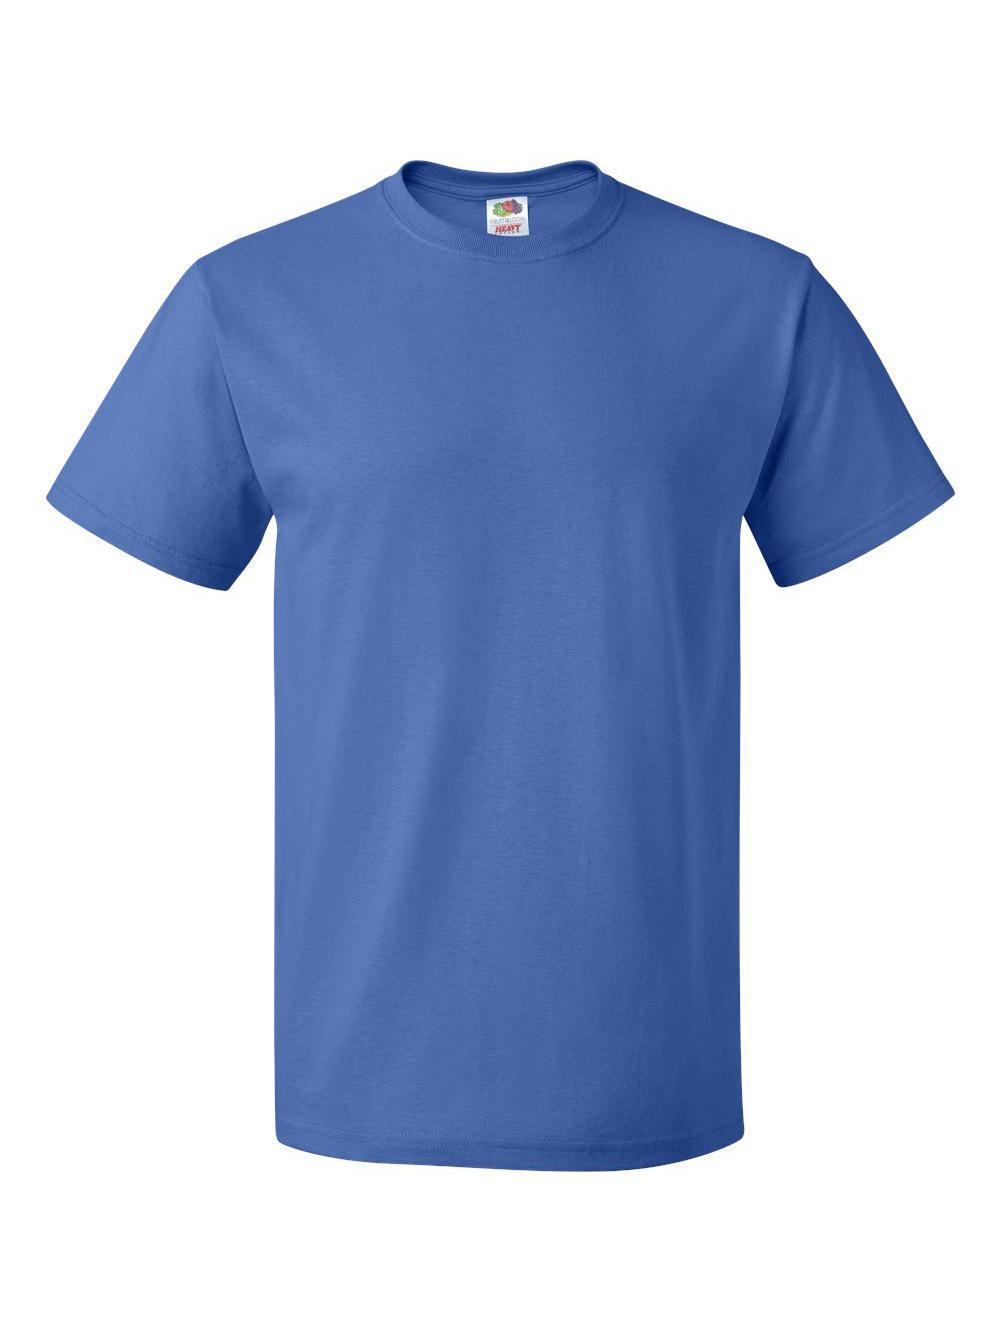 Fruit-of-the-Loom-HD-Cotton-Short-Sleeve-T-Shirt-3930R thumbnail 111